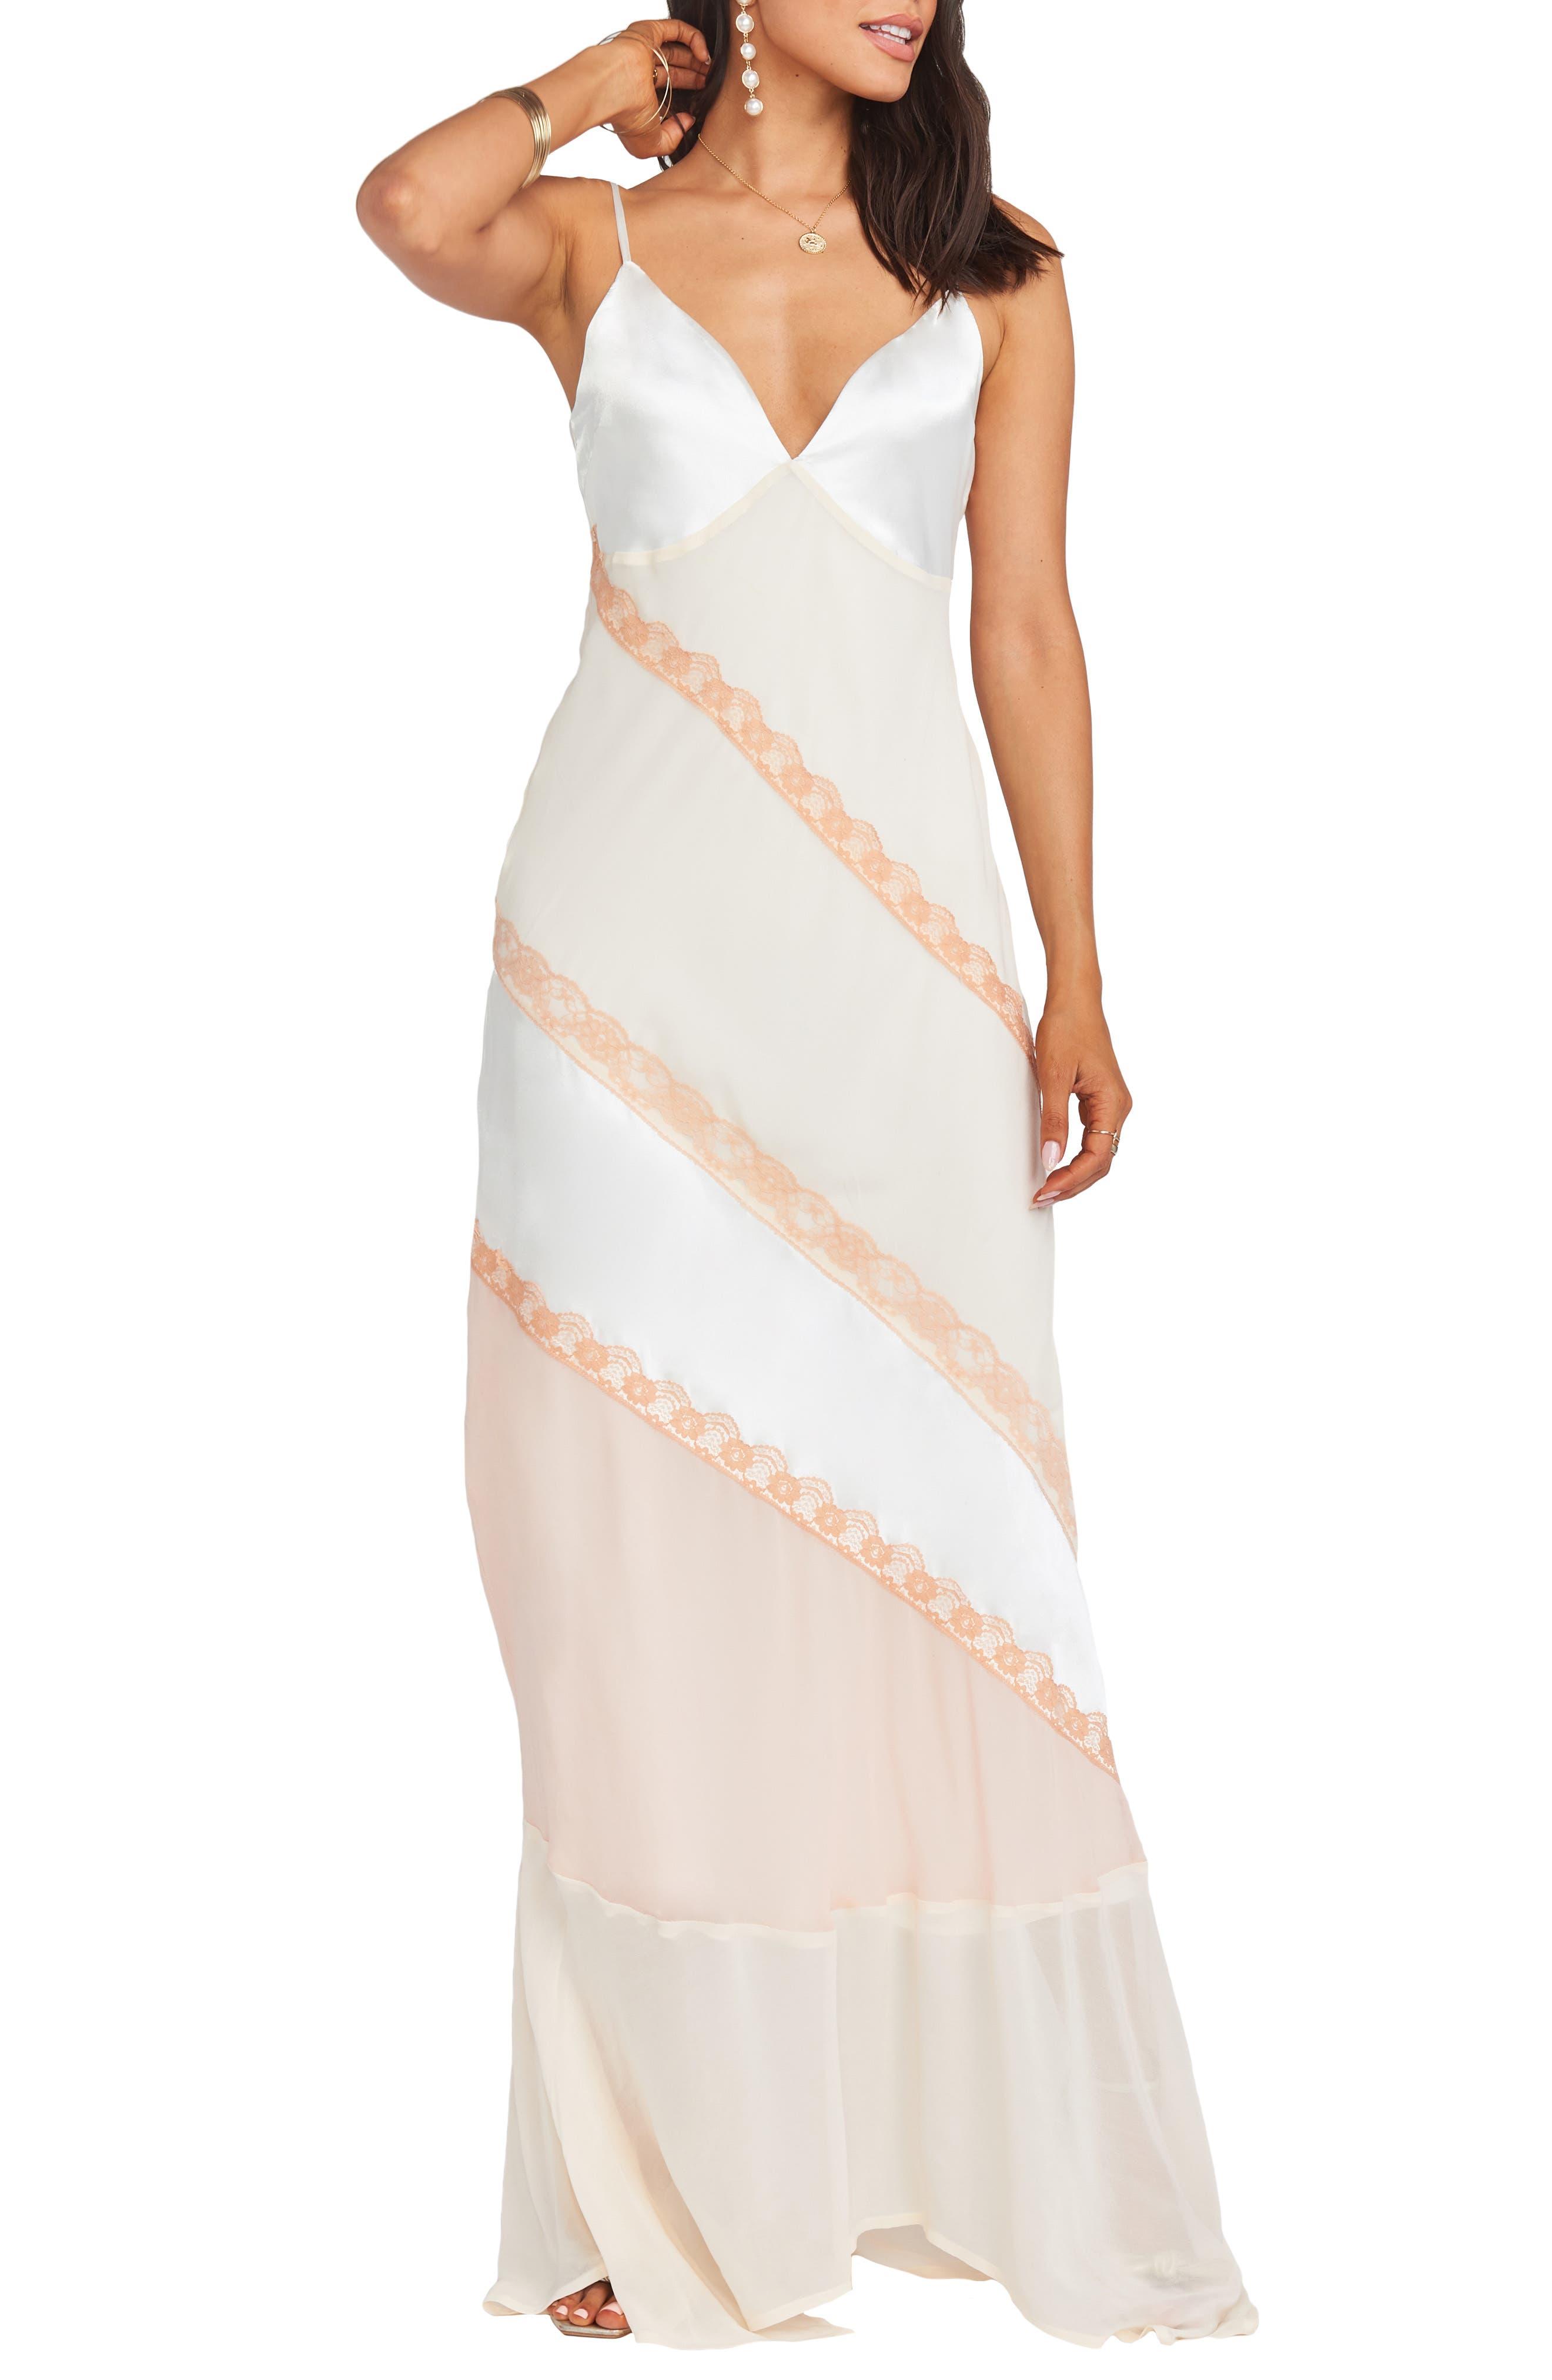 60s Wedding Dresses | 70s Wedding Dresses Womens Show Me Your Mumu Allure Colorblock Slipdress $168.00 AT vintagedancer.com